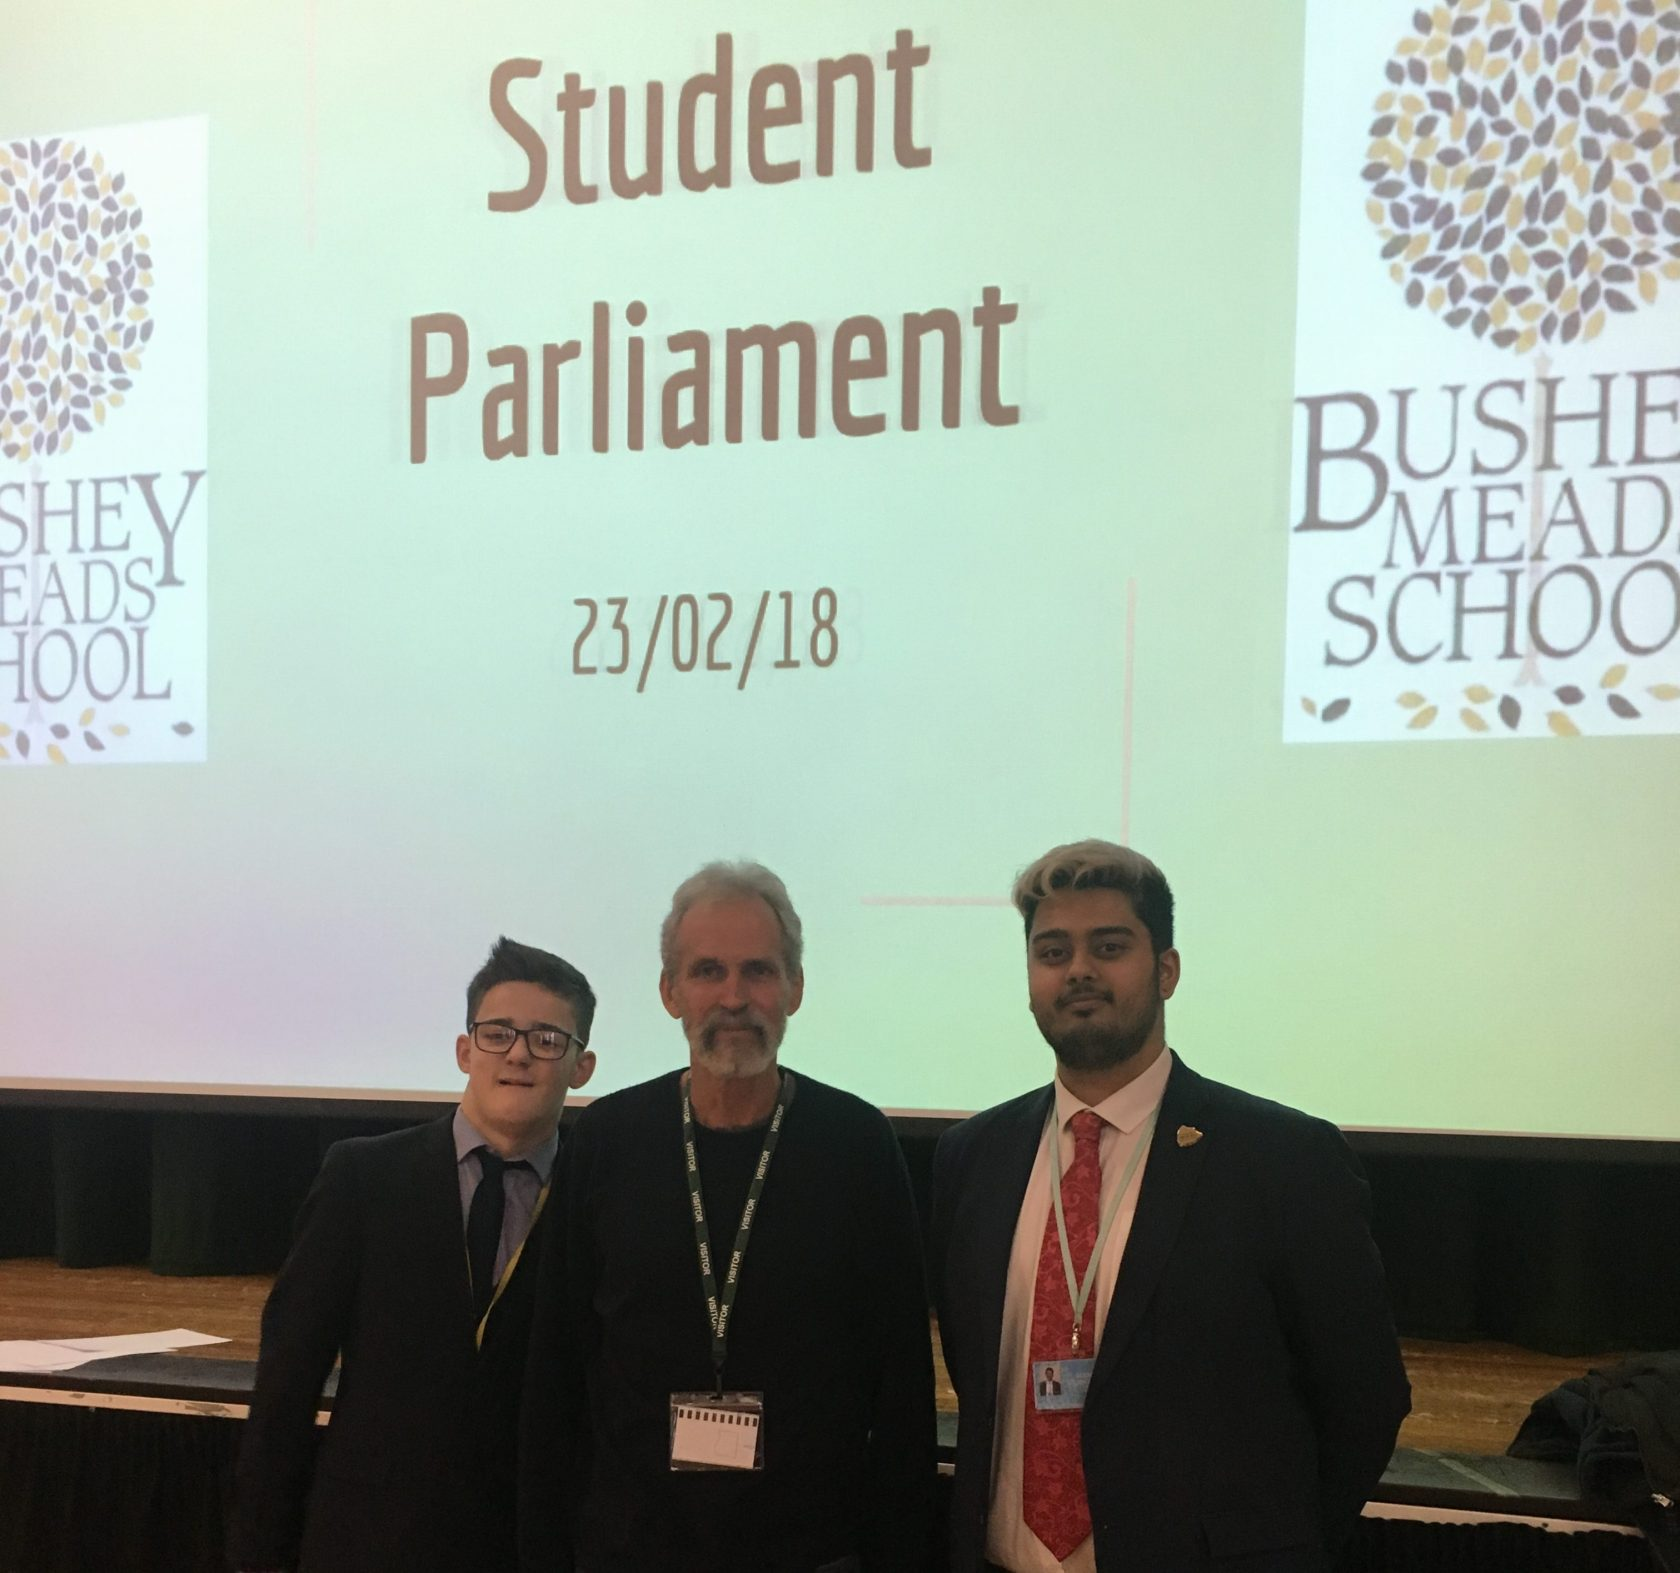 Student Parliament Meeting